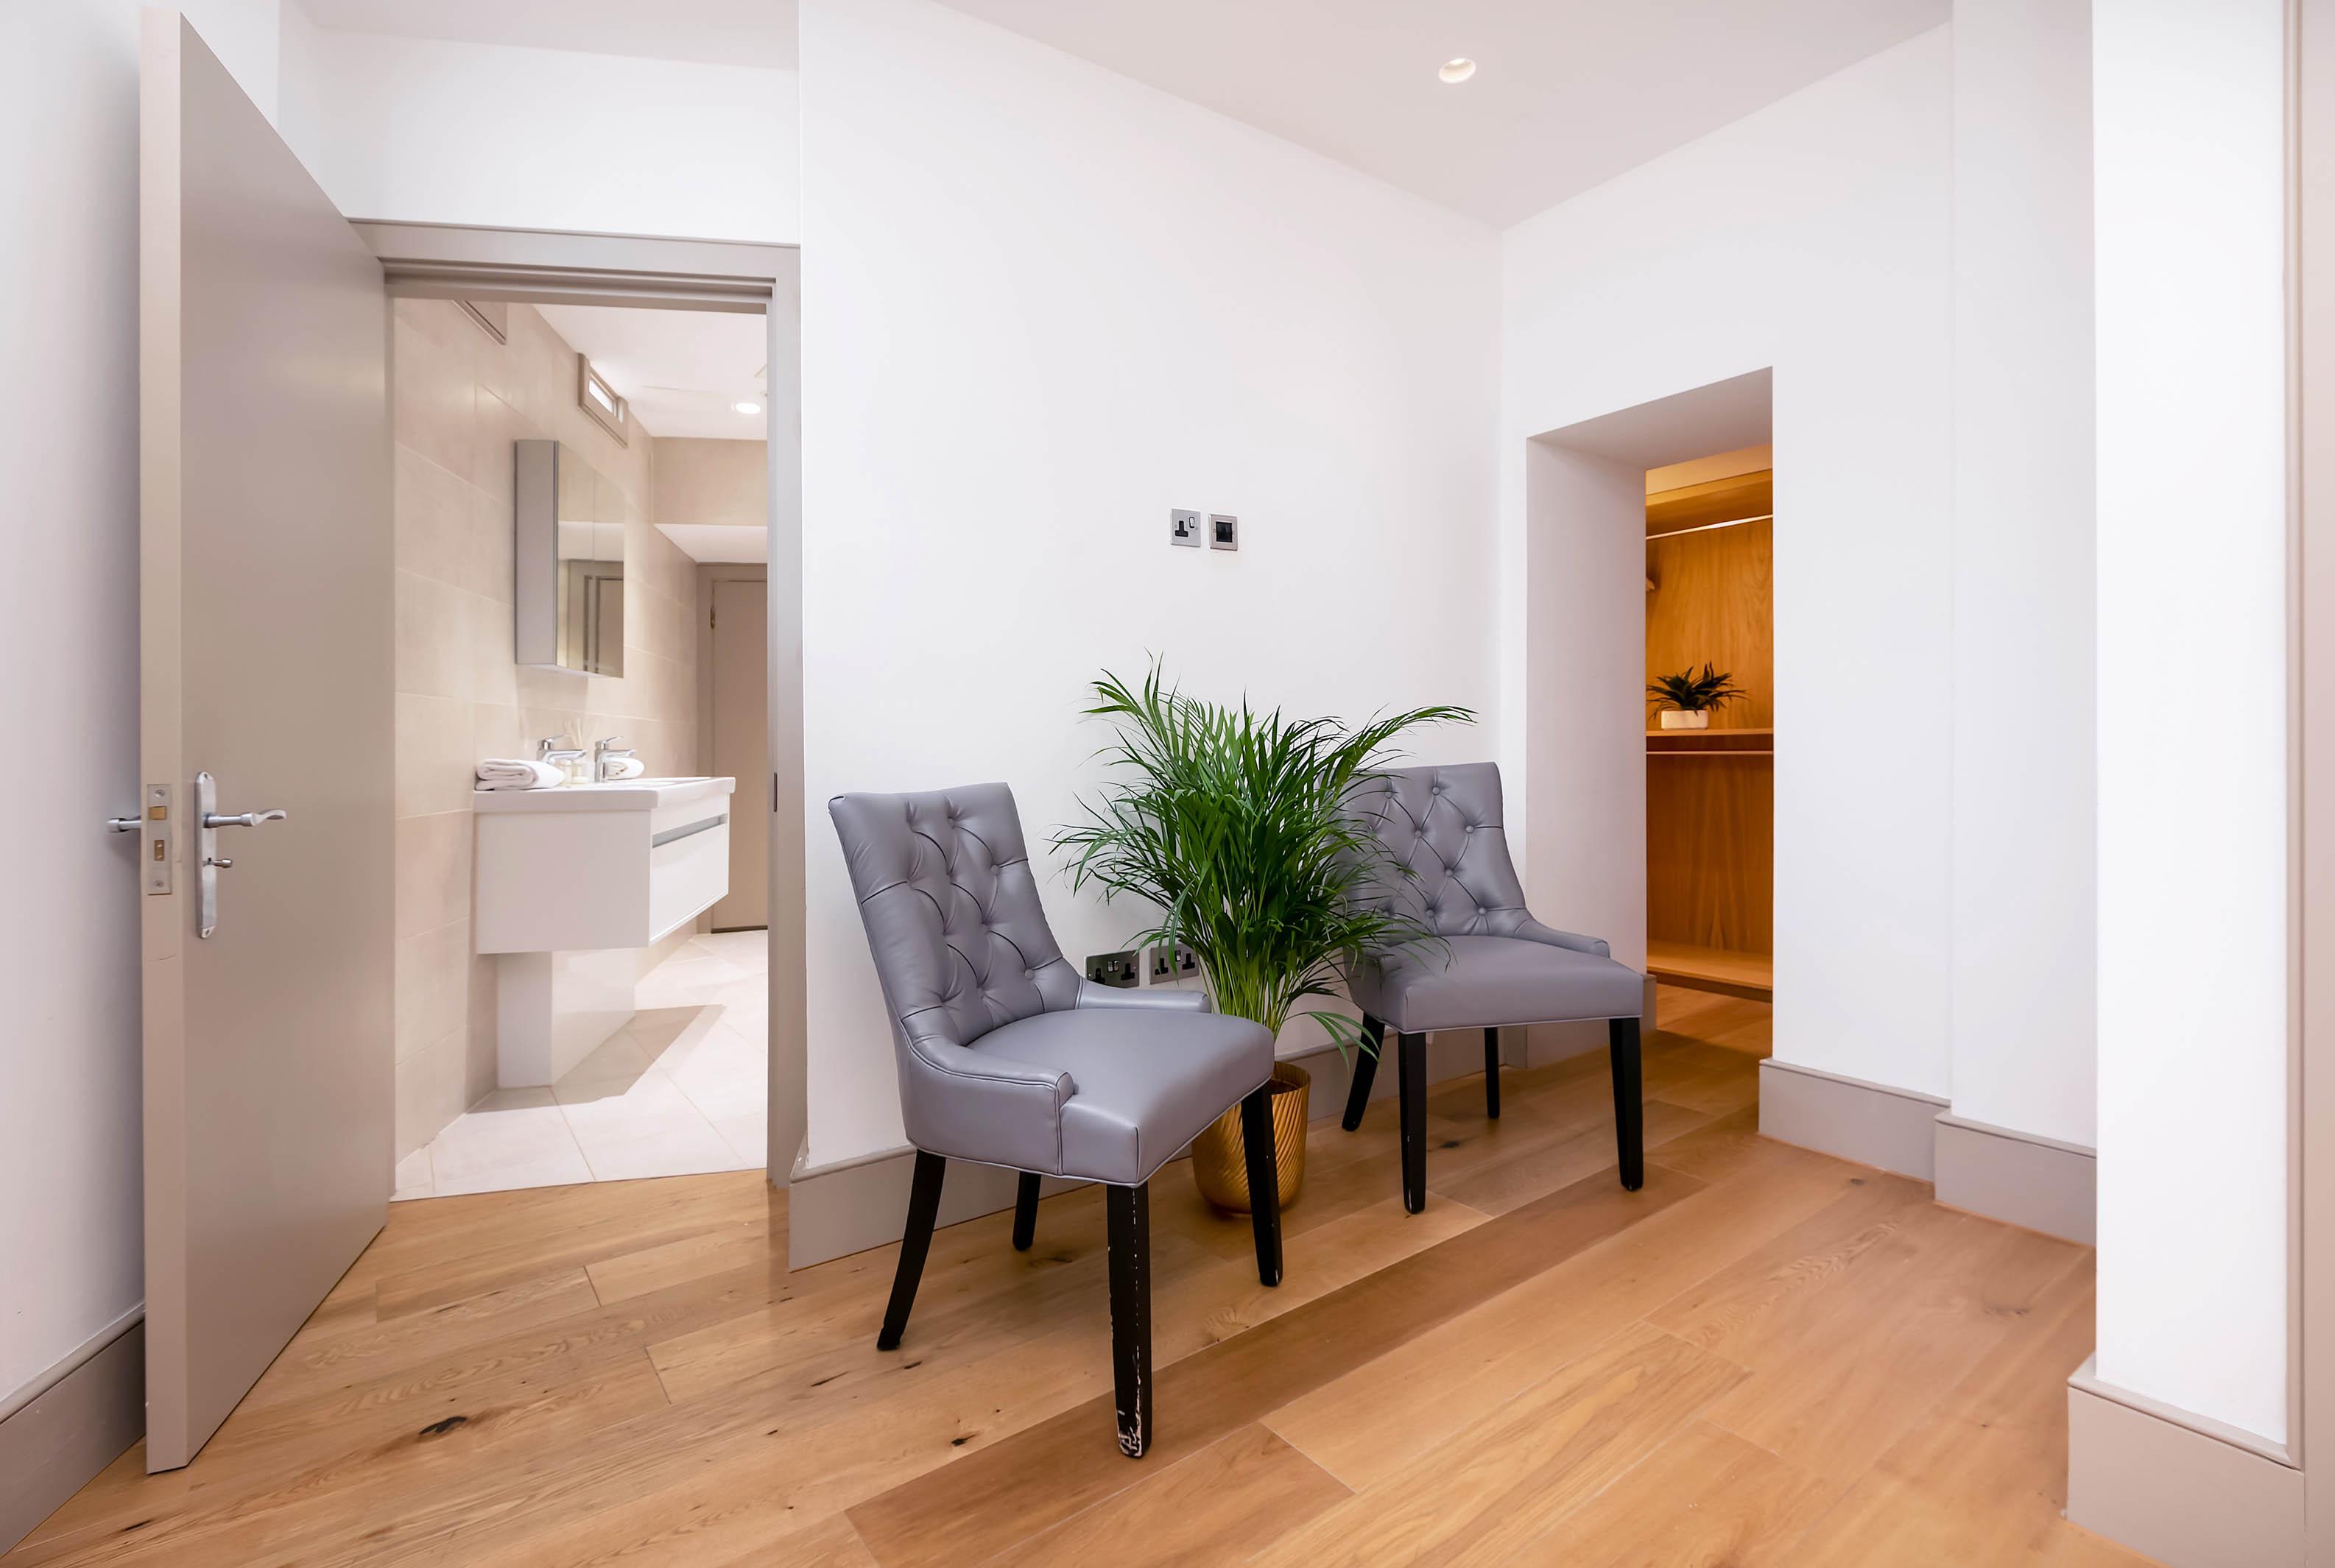 Lovelydays luxury service apartment rental - London - Fitzrovia - Wells Mews B - Lovelysuite - 2 bedrooms - 2 bathrooms - Double bed - 4b5da2769602 - Lovelydays